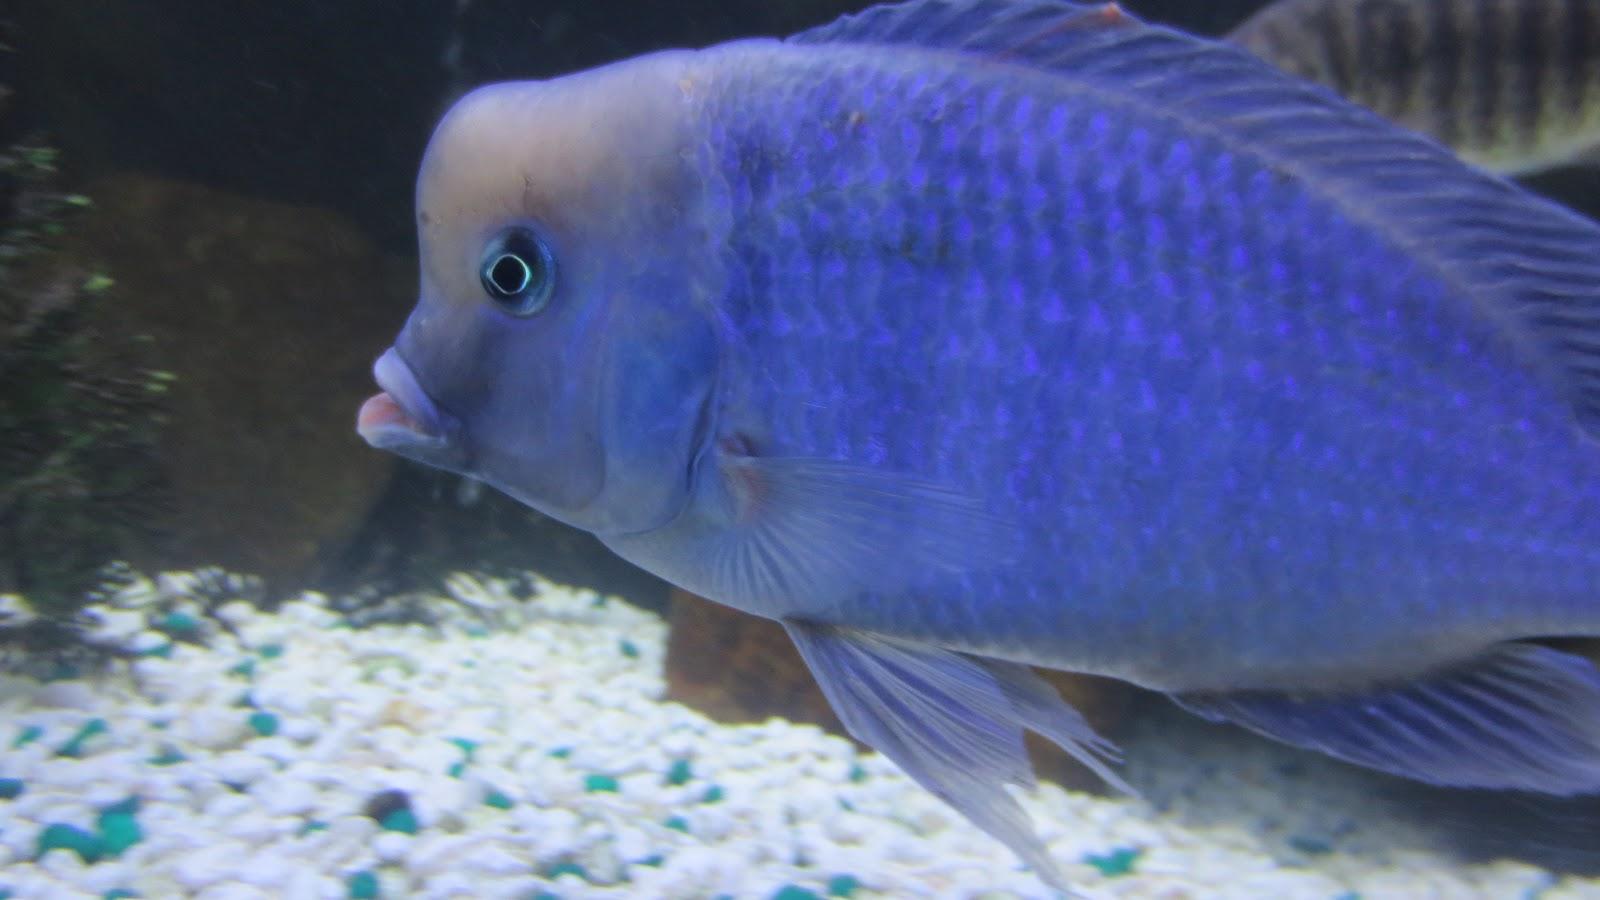 mal/tang fish: Cyrtocara moorii Blue Dolphin, 12-24-12